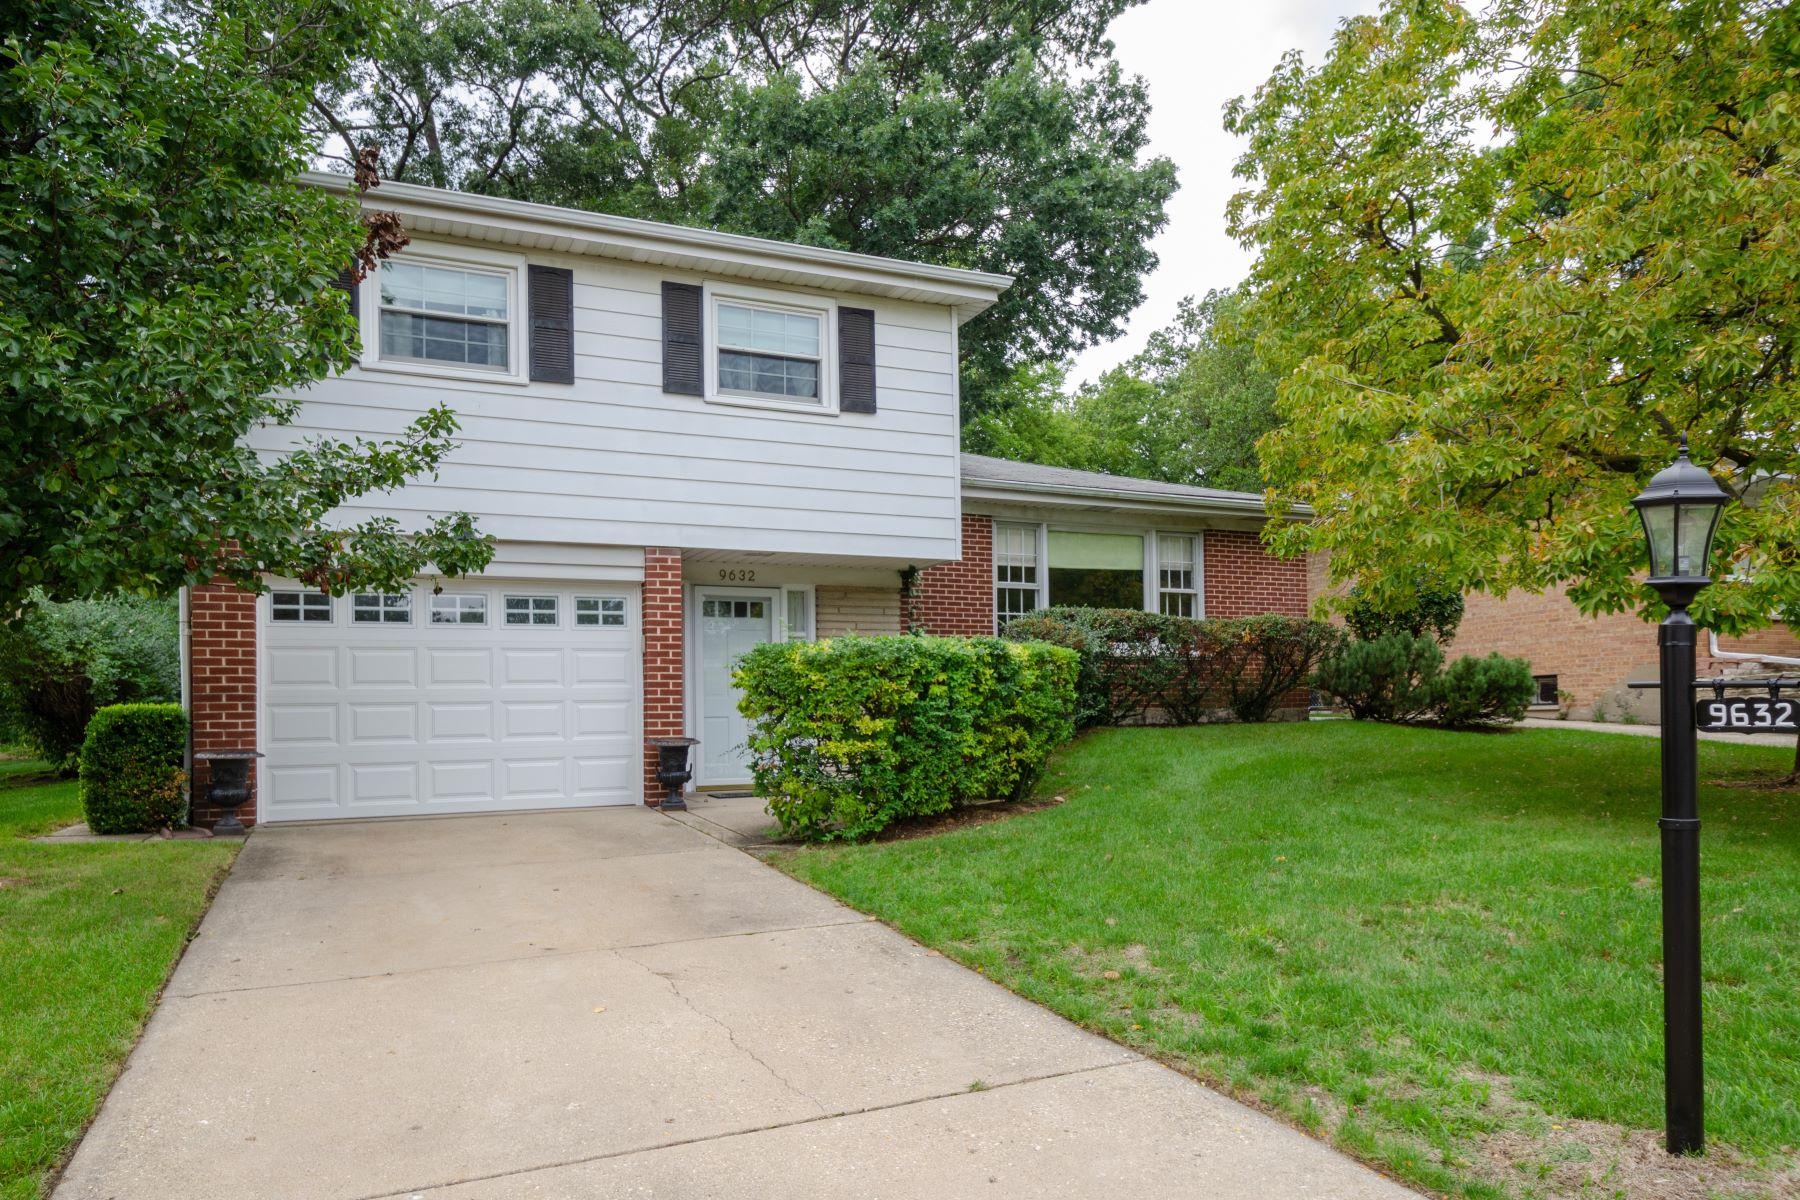 Single Family Homes for Active at Pristine tri-level 9632 S Kildare Avenue Skokie, Illinois 60076 United States